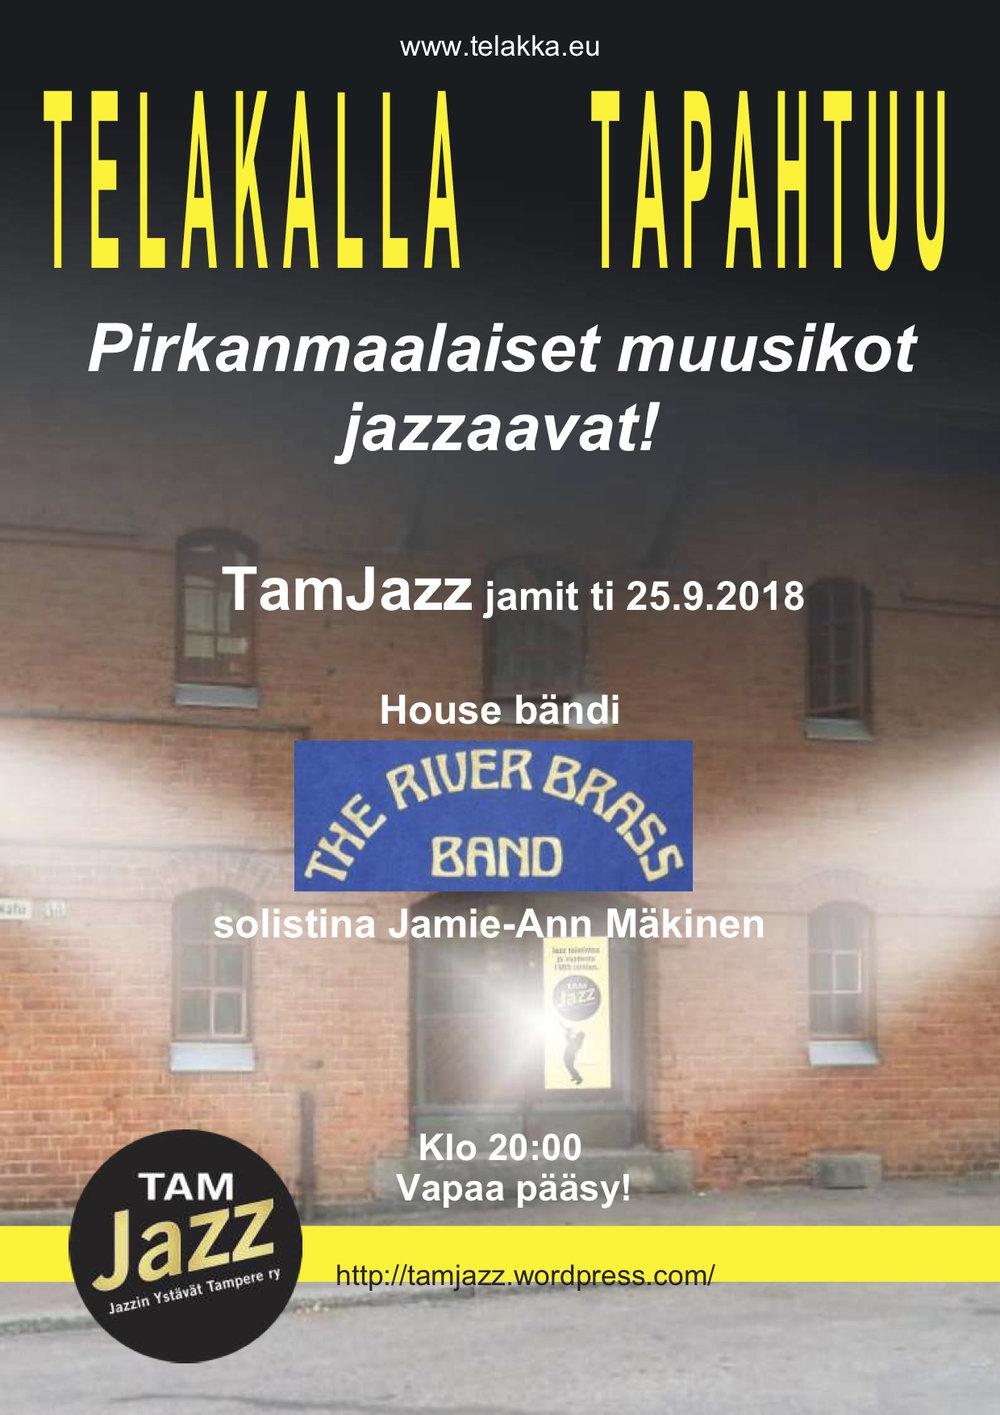 TamJazz jamit ti 25.9.2018 The River Brass Band.jpg